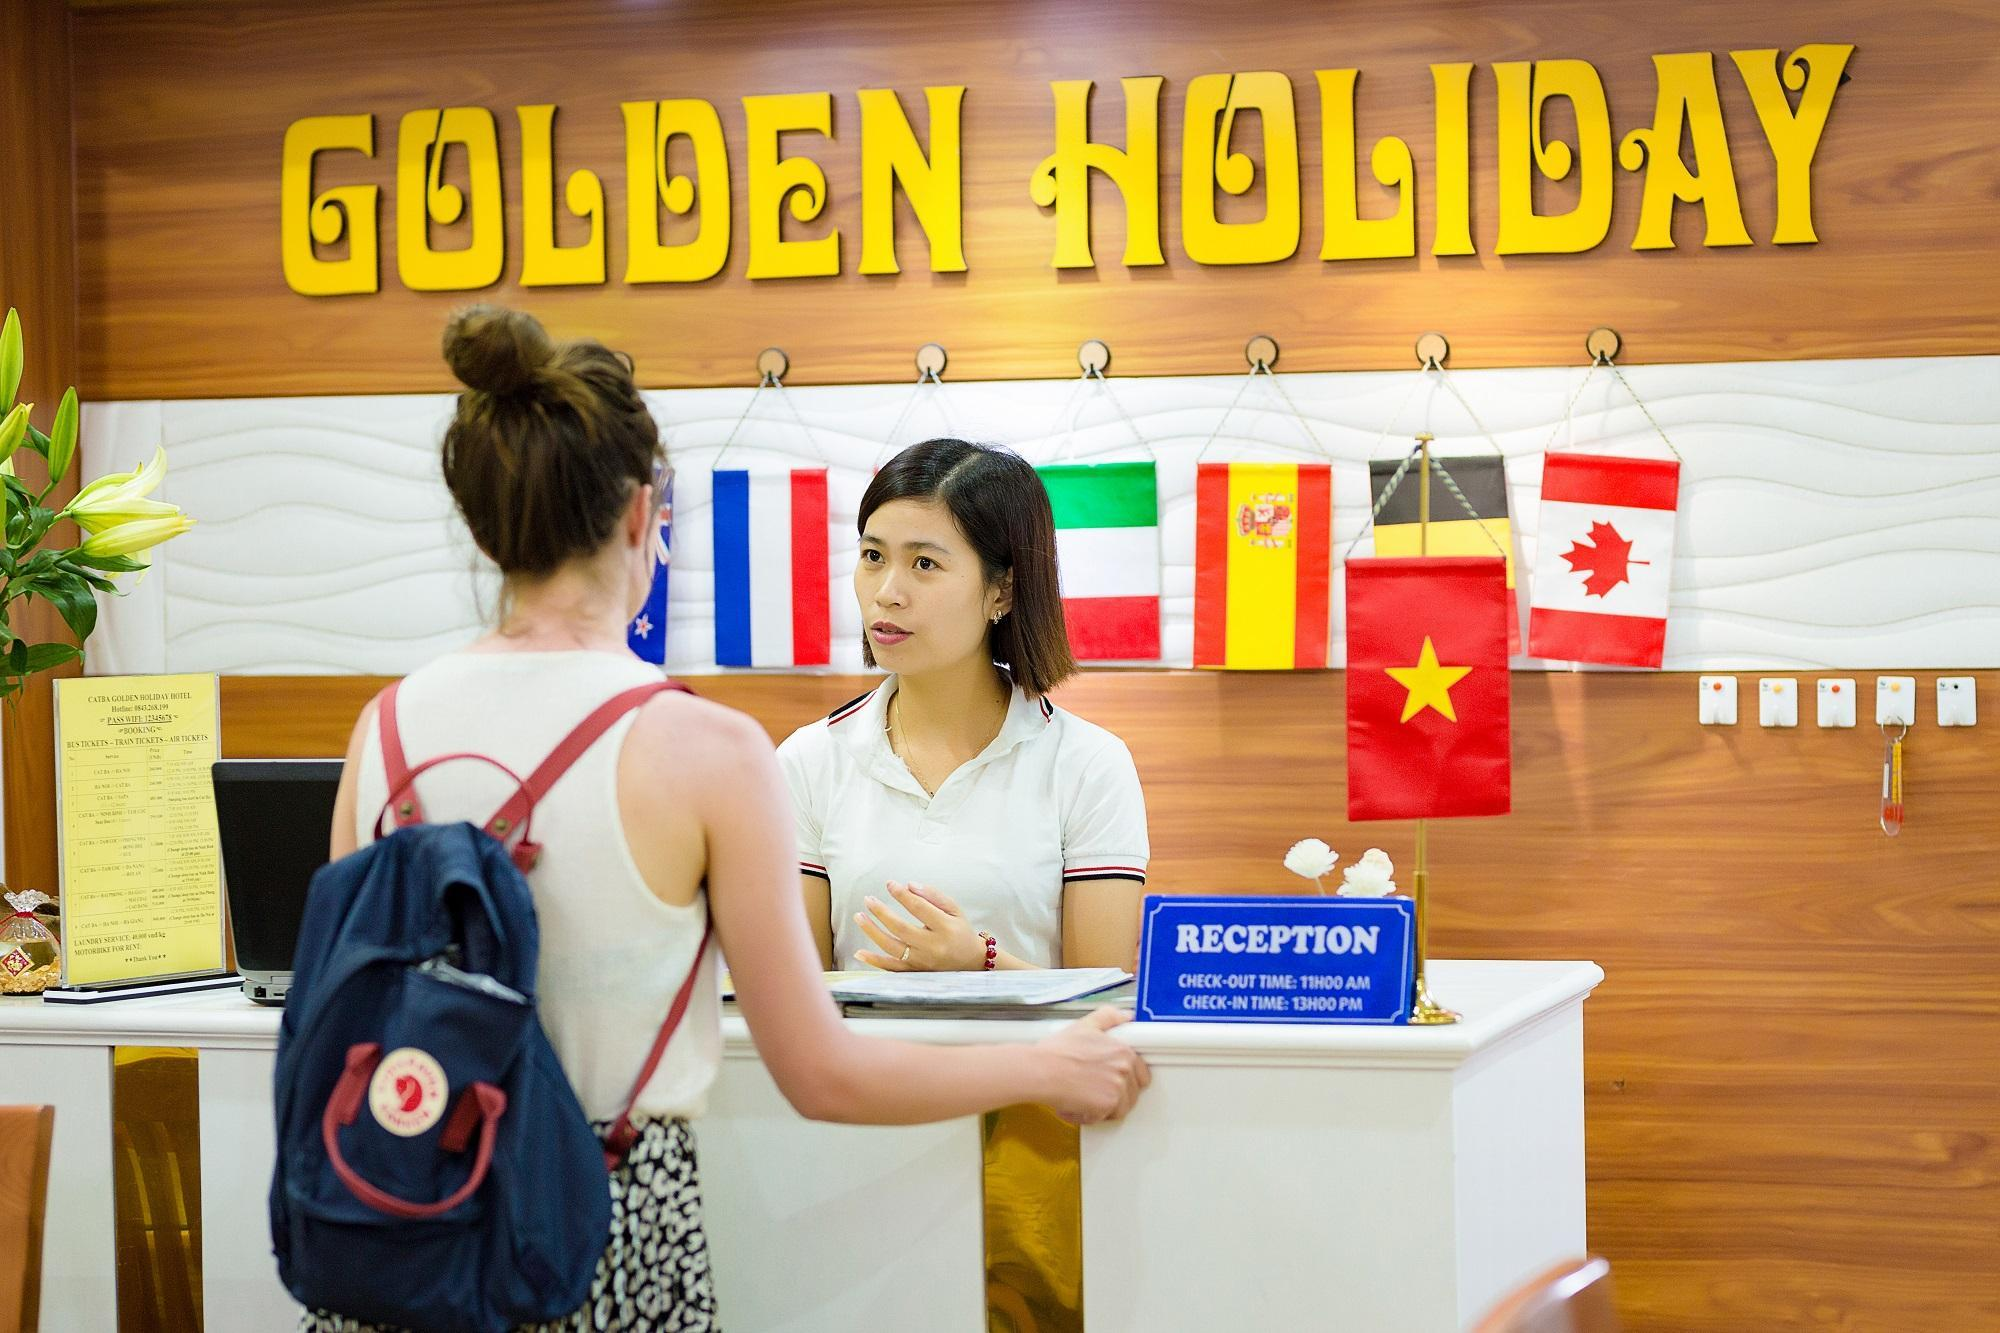 CB Golden Holiday Hotel